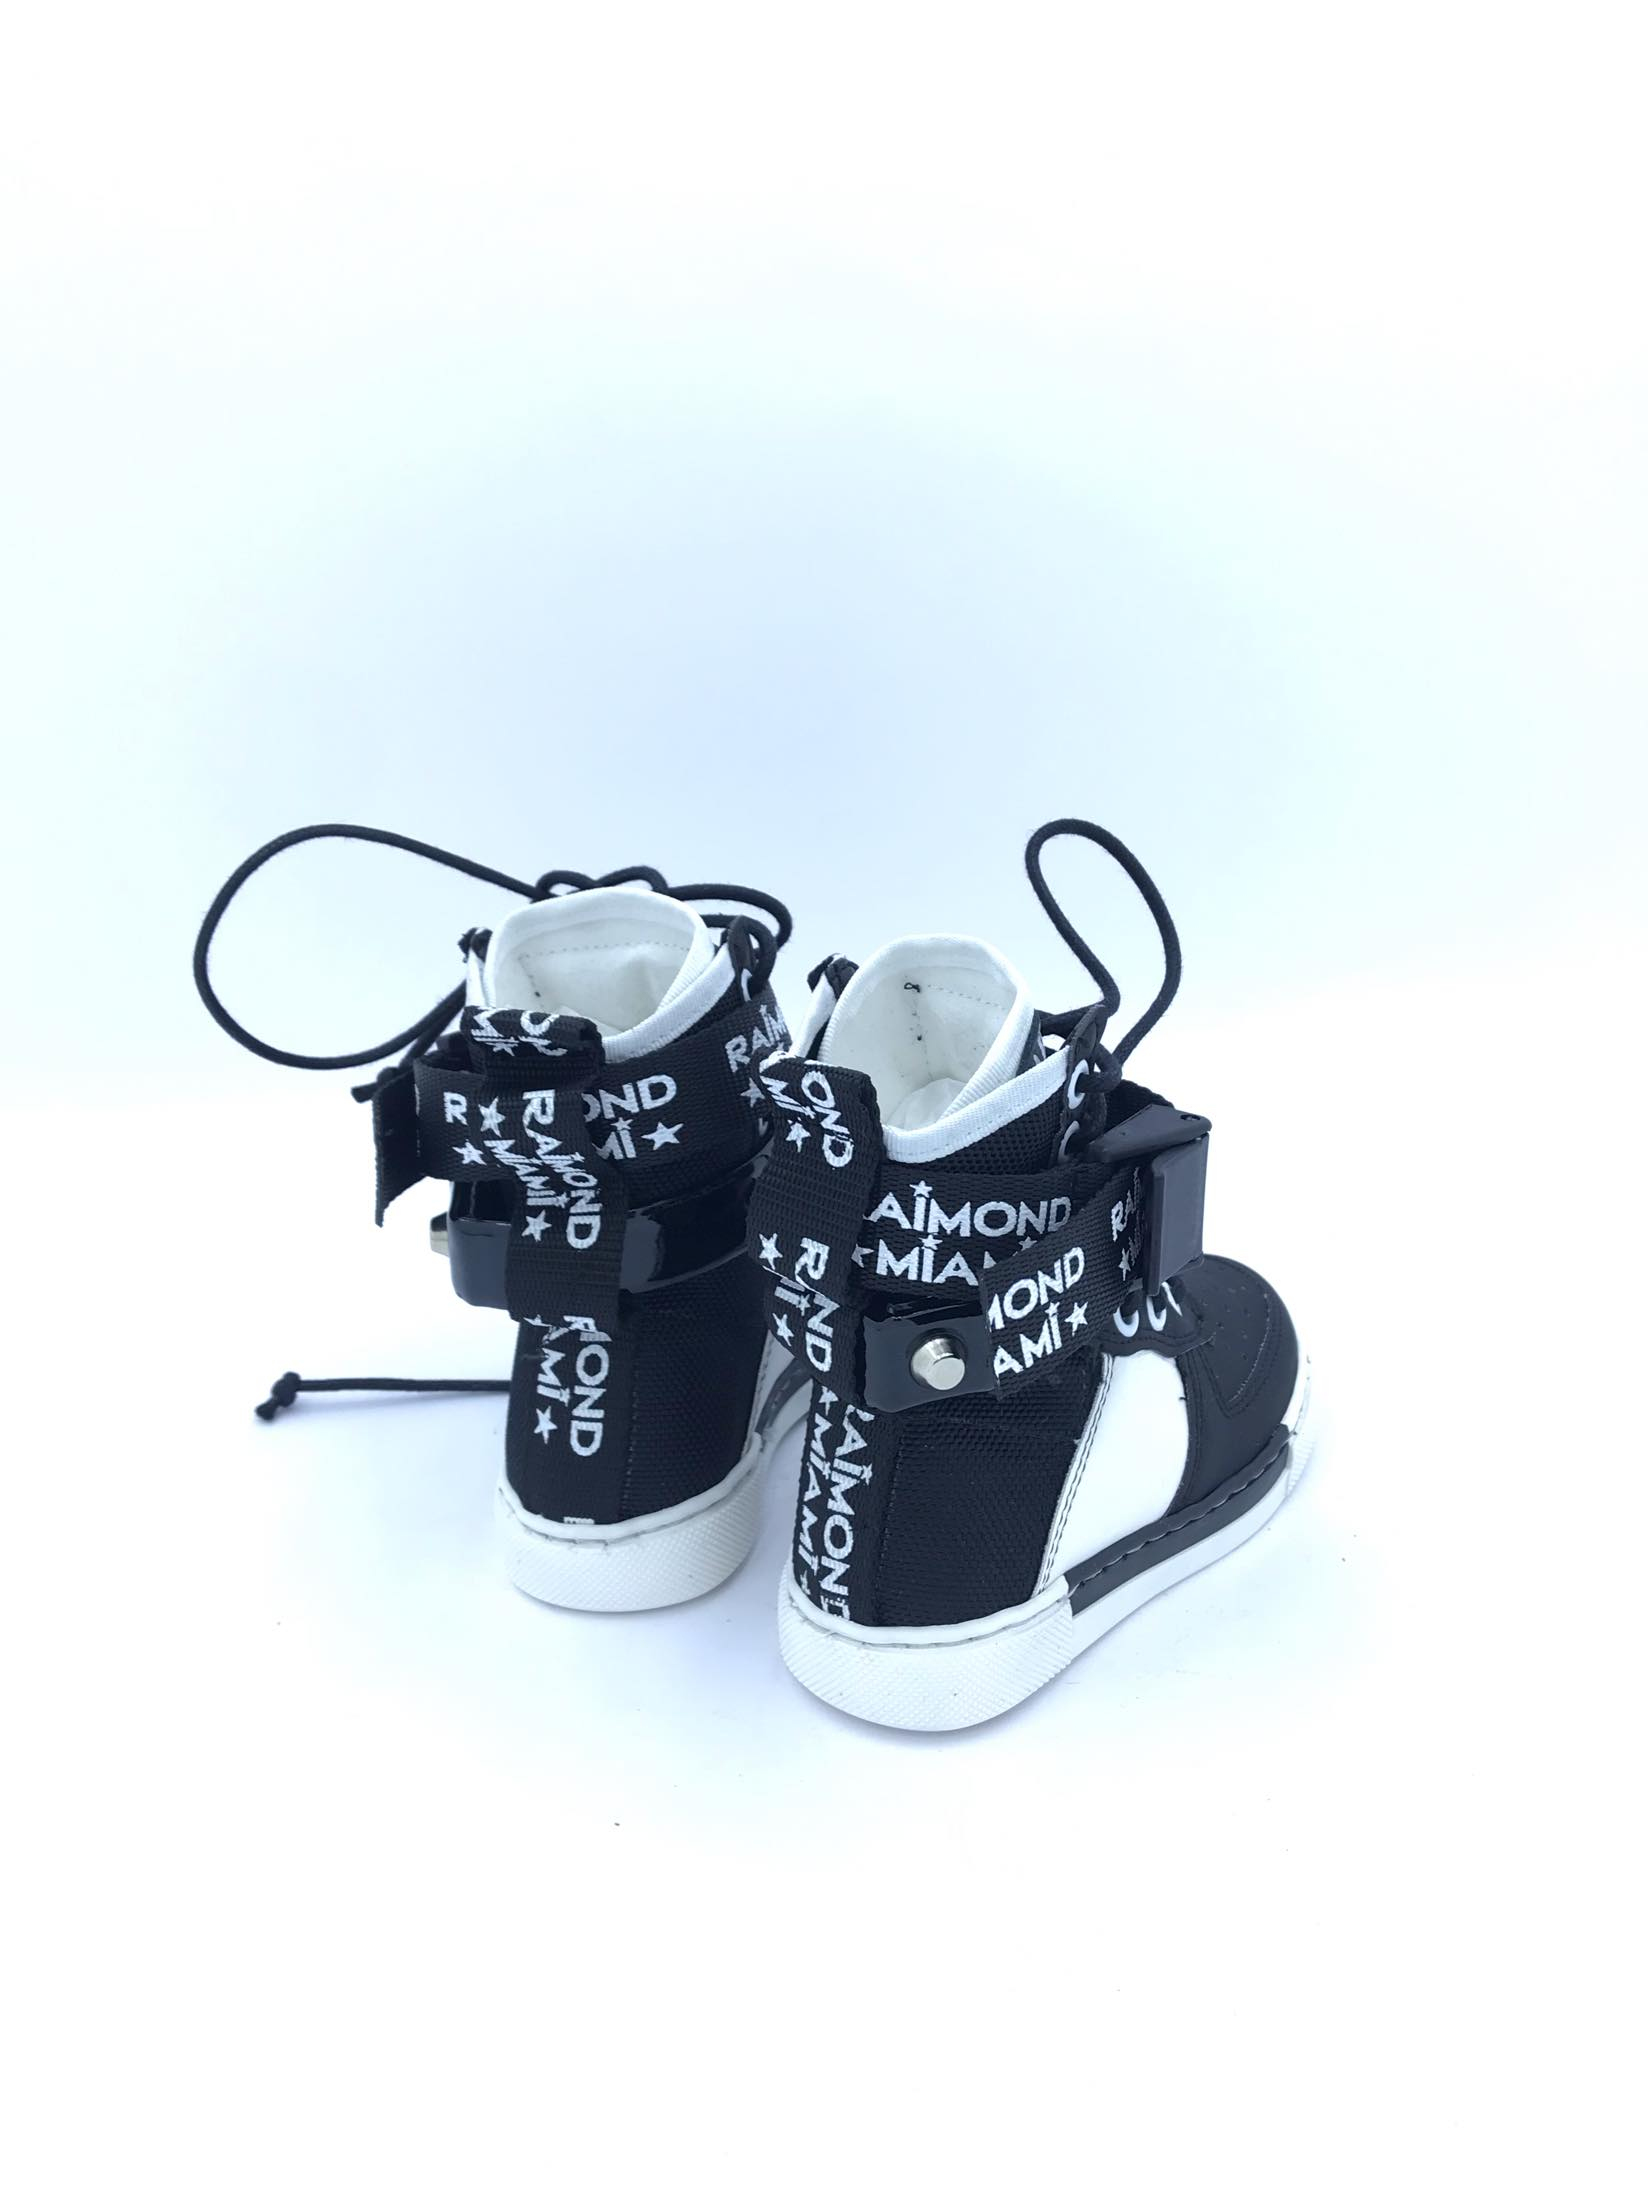 RAIMOND MIAMI OCEAN DRIVE BABY BLACK/WHITE ANGEL